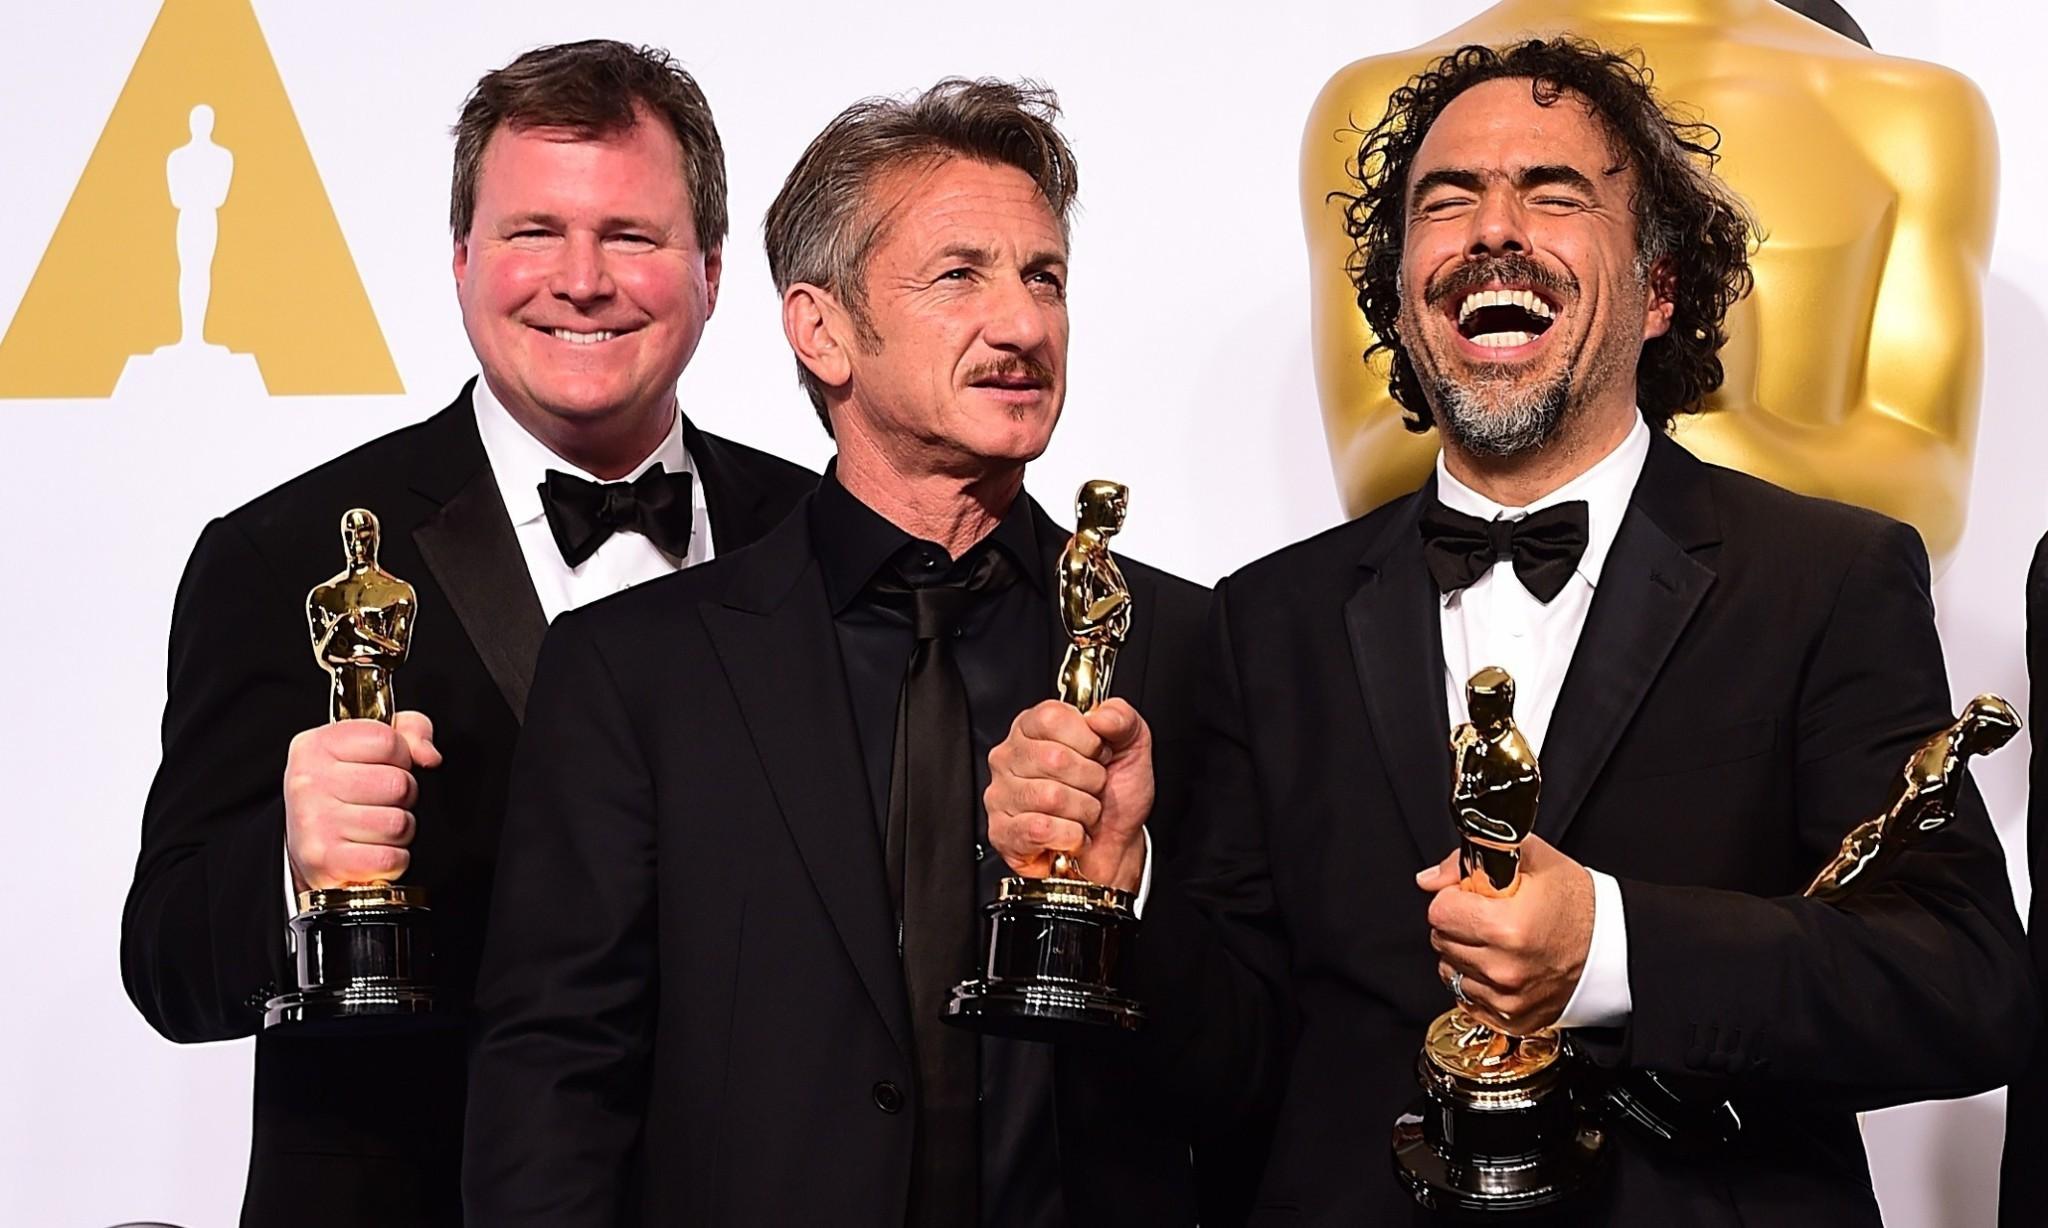 Sean Penn's green card gag falls flat, but was it just a joke between friends?